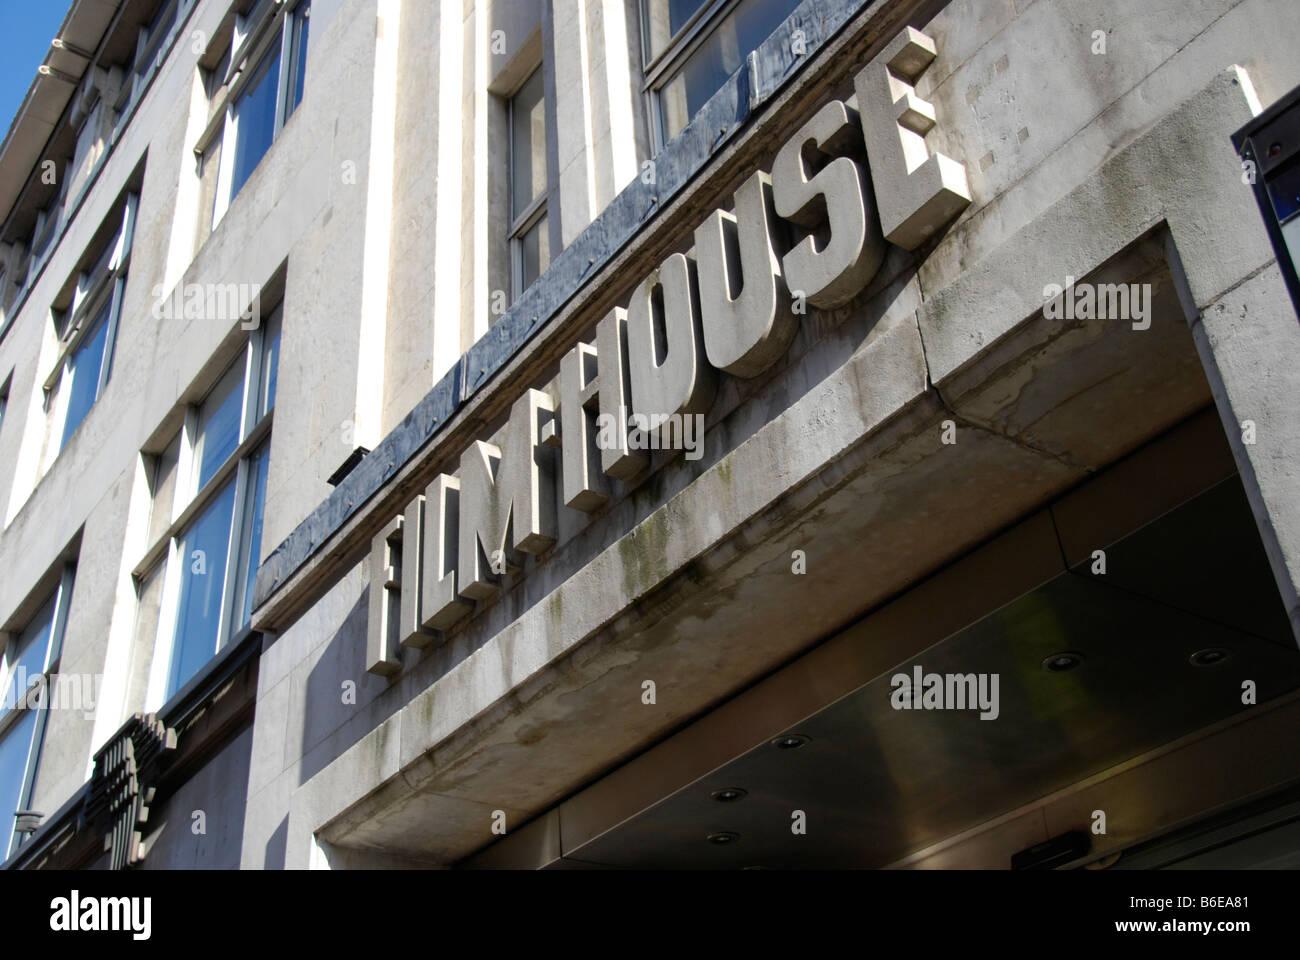 Film House in Wardour Street London England - Stock Image